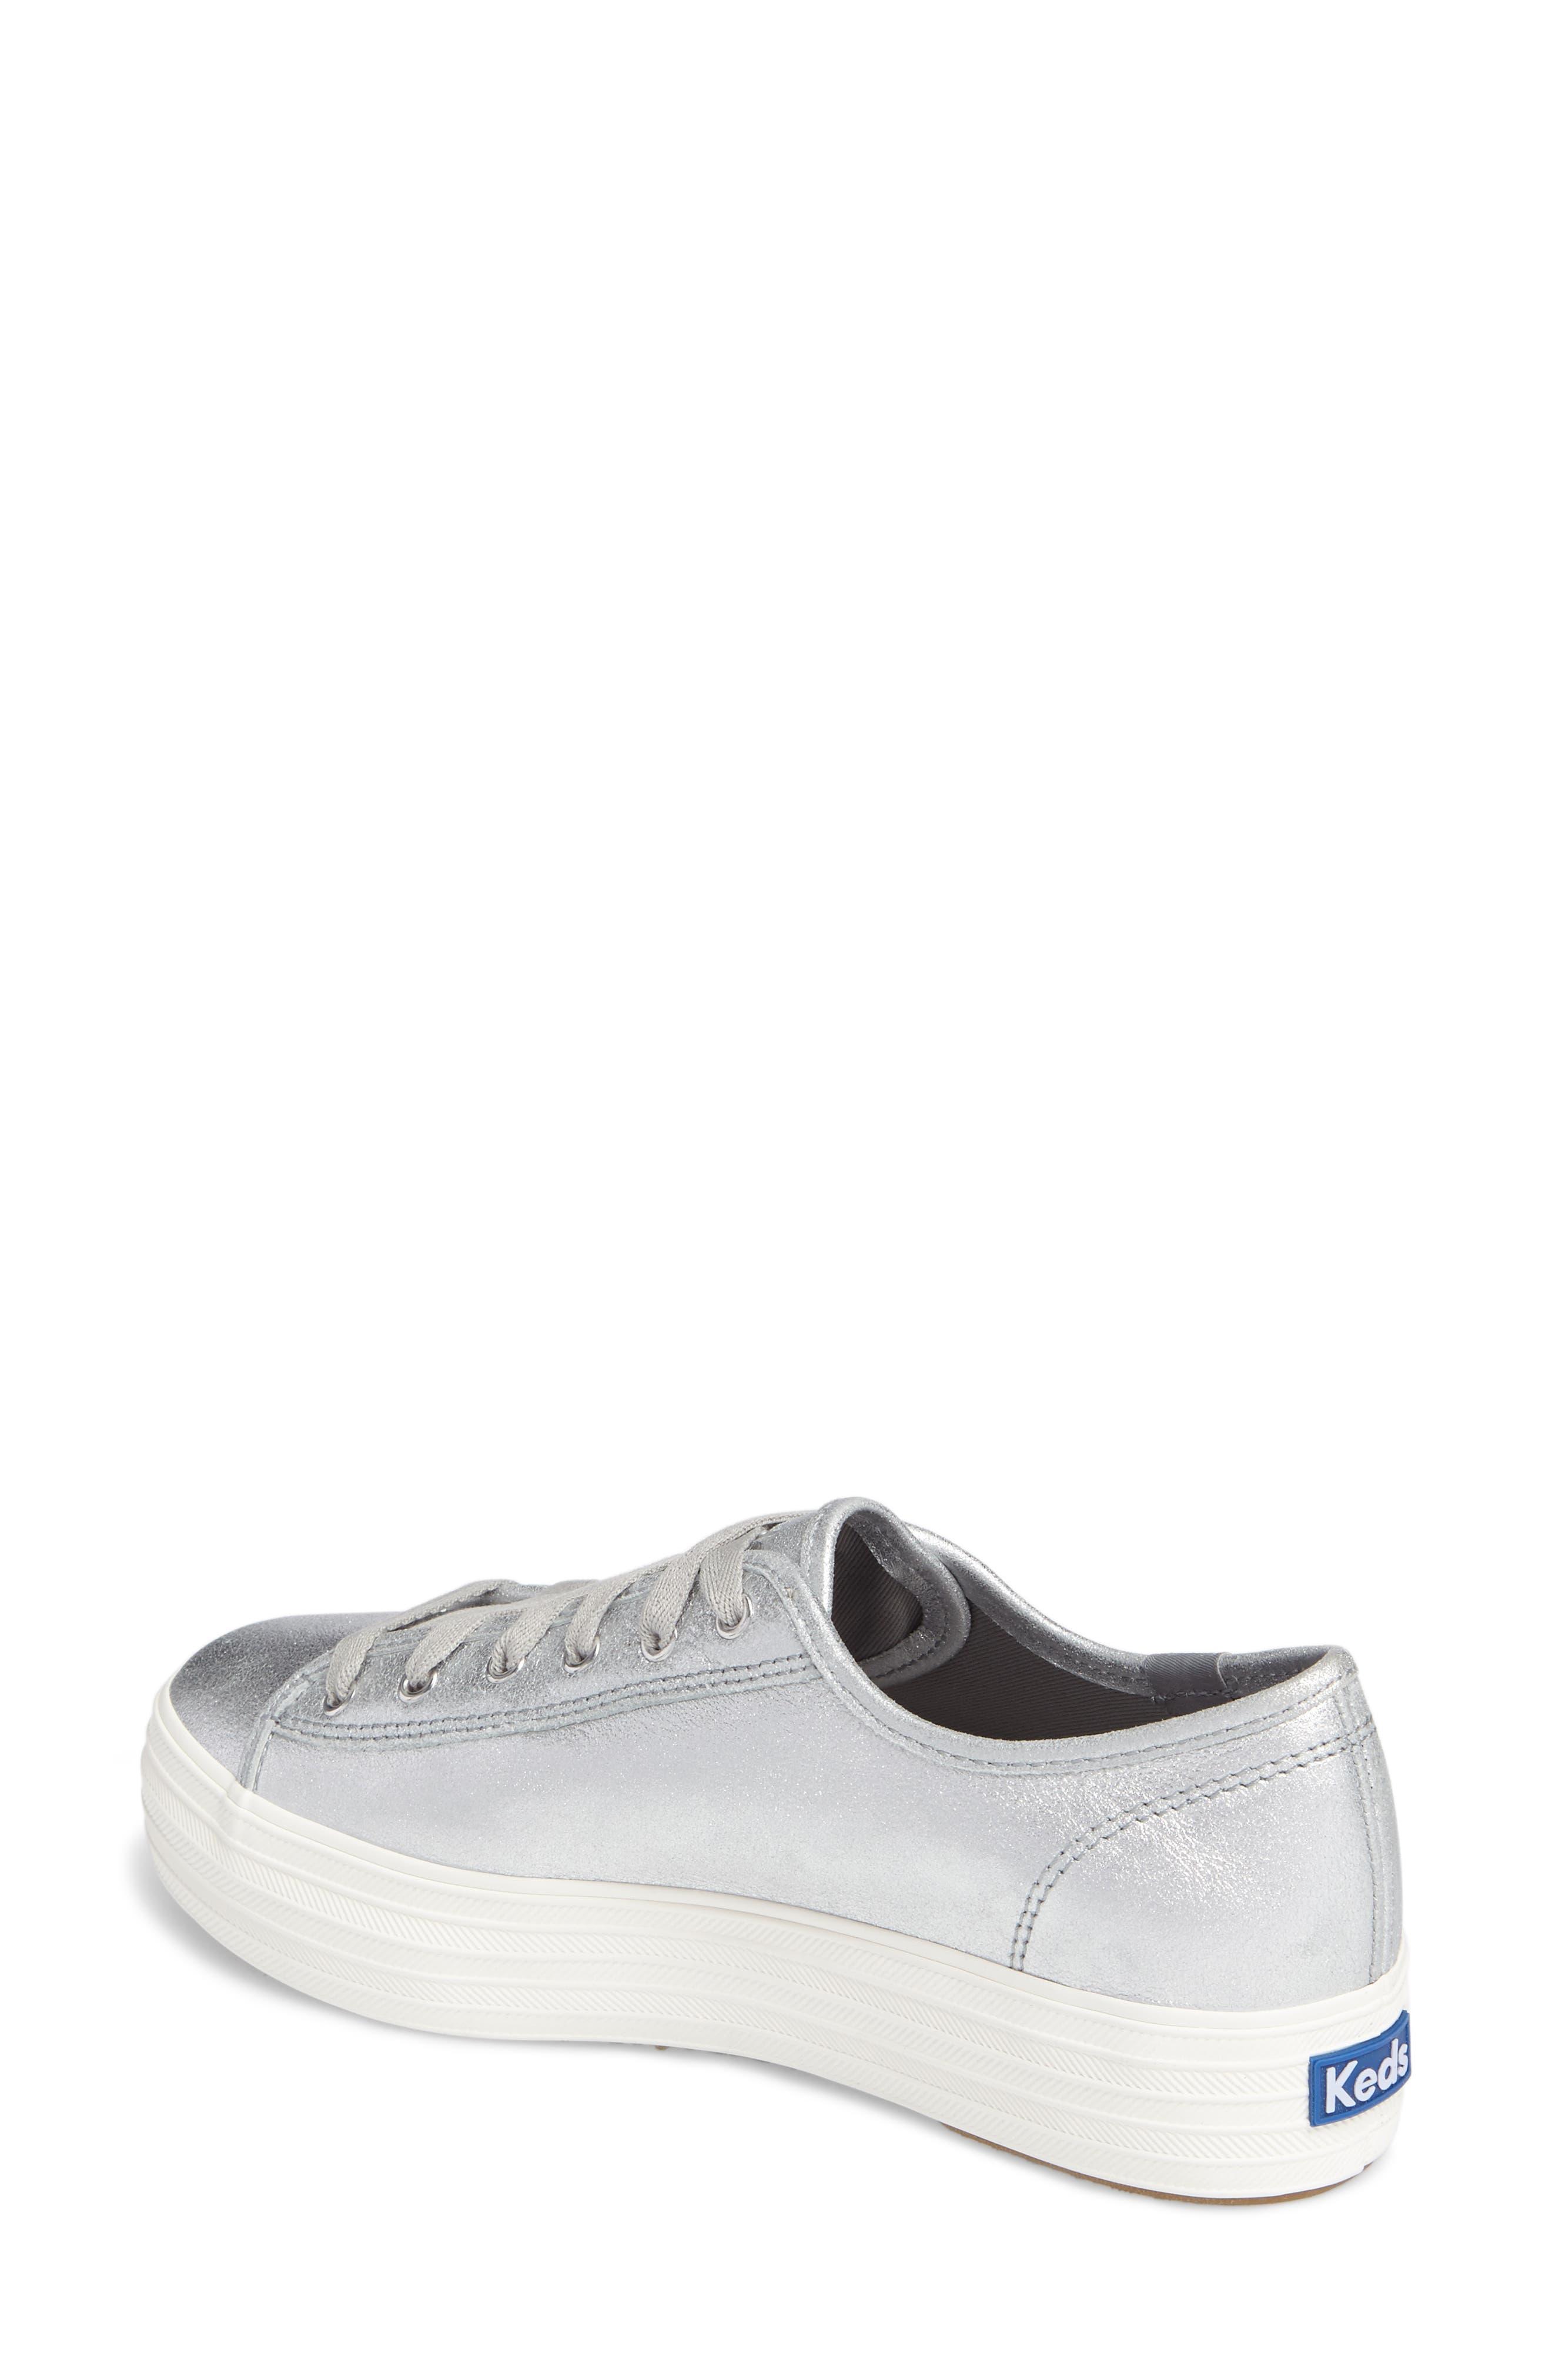 Triple Kick Platform Sneaker,                             Alternate thumbnail 2, color,                             Silver